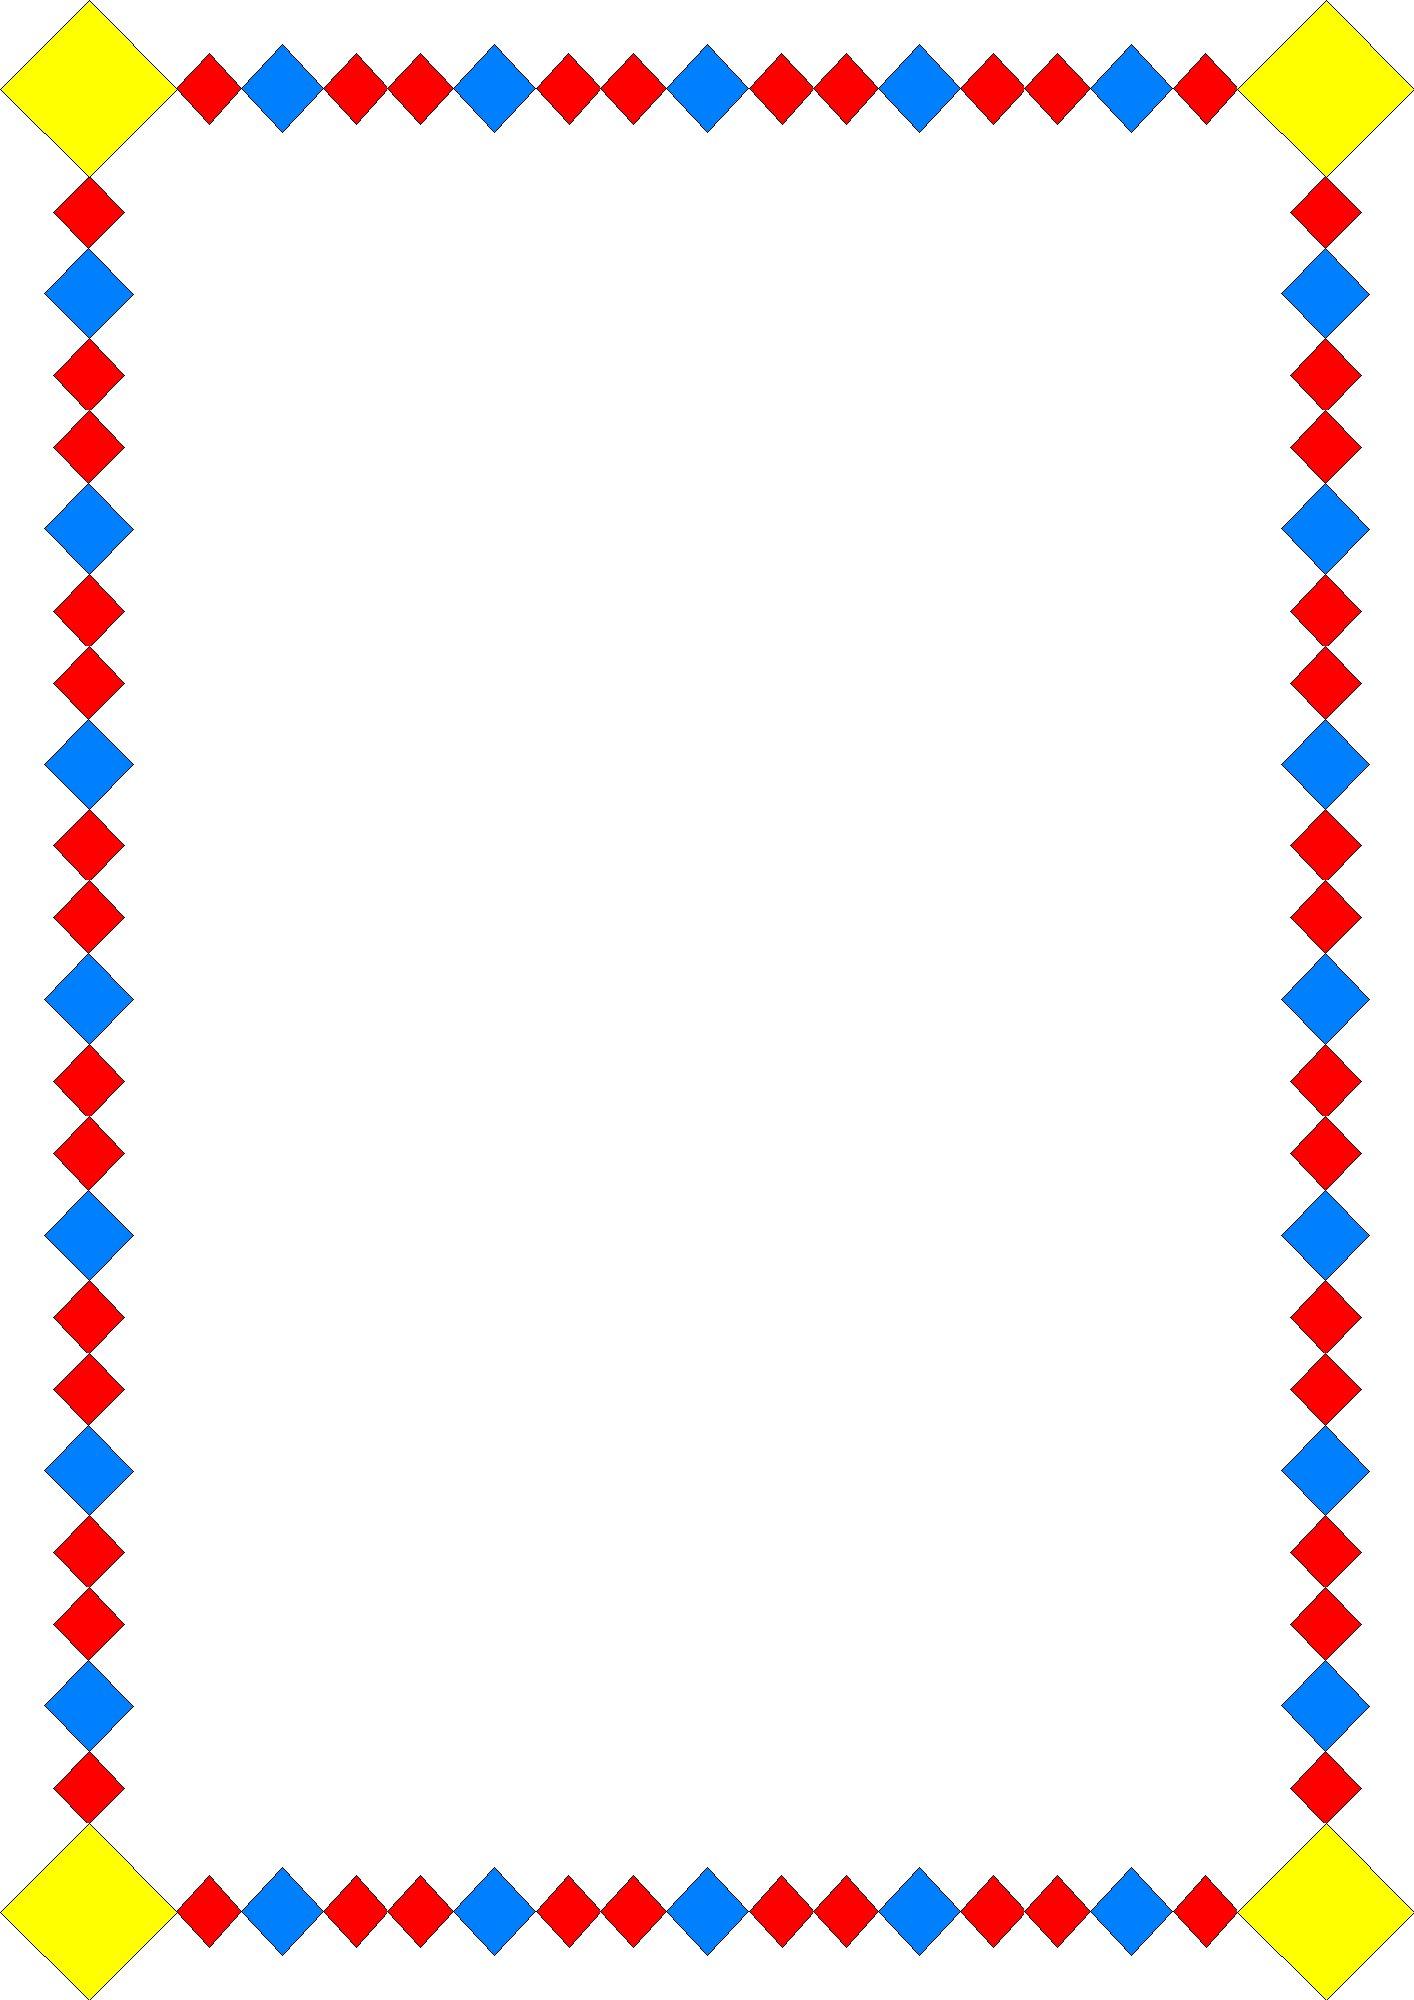 Frames Clip Art - Clipart Frames And Borders